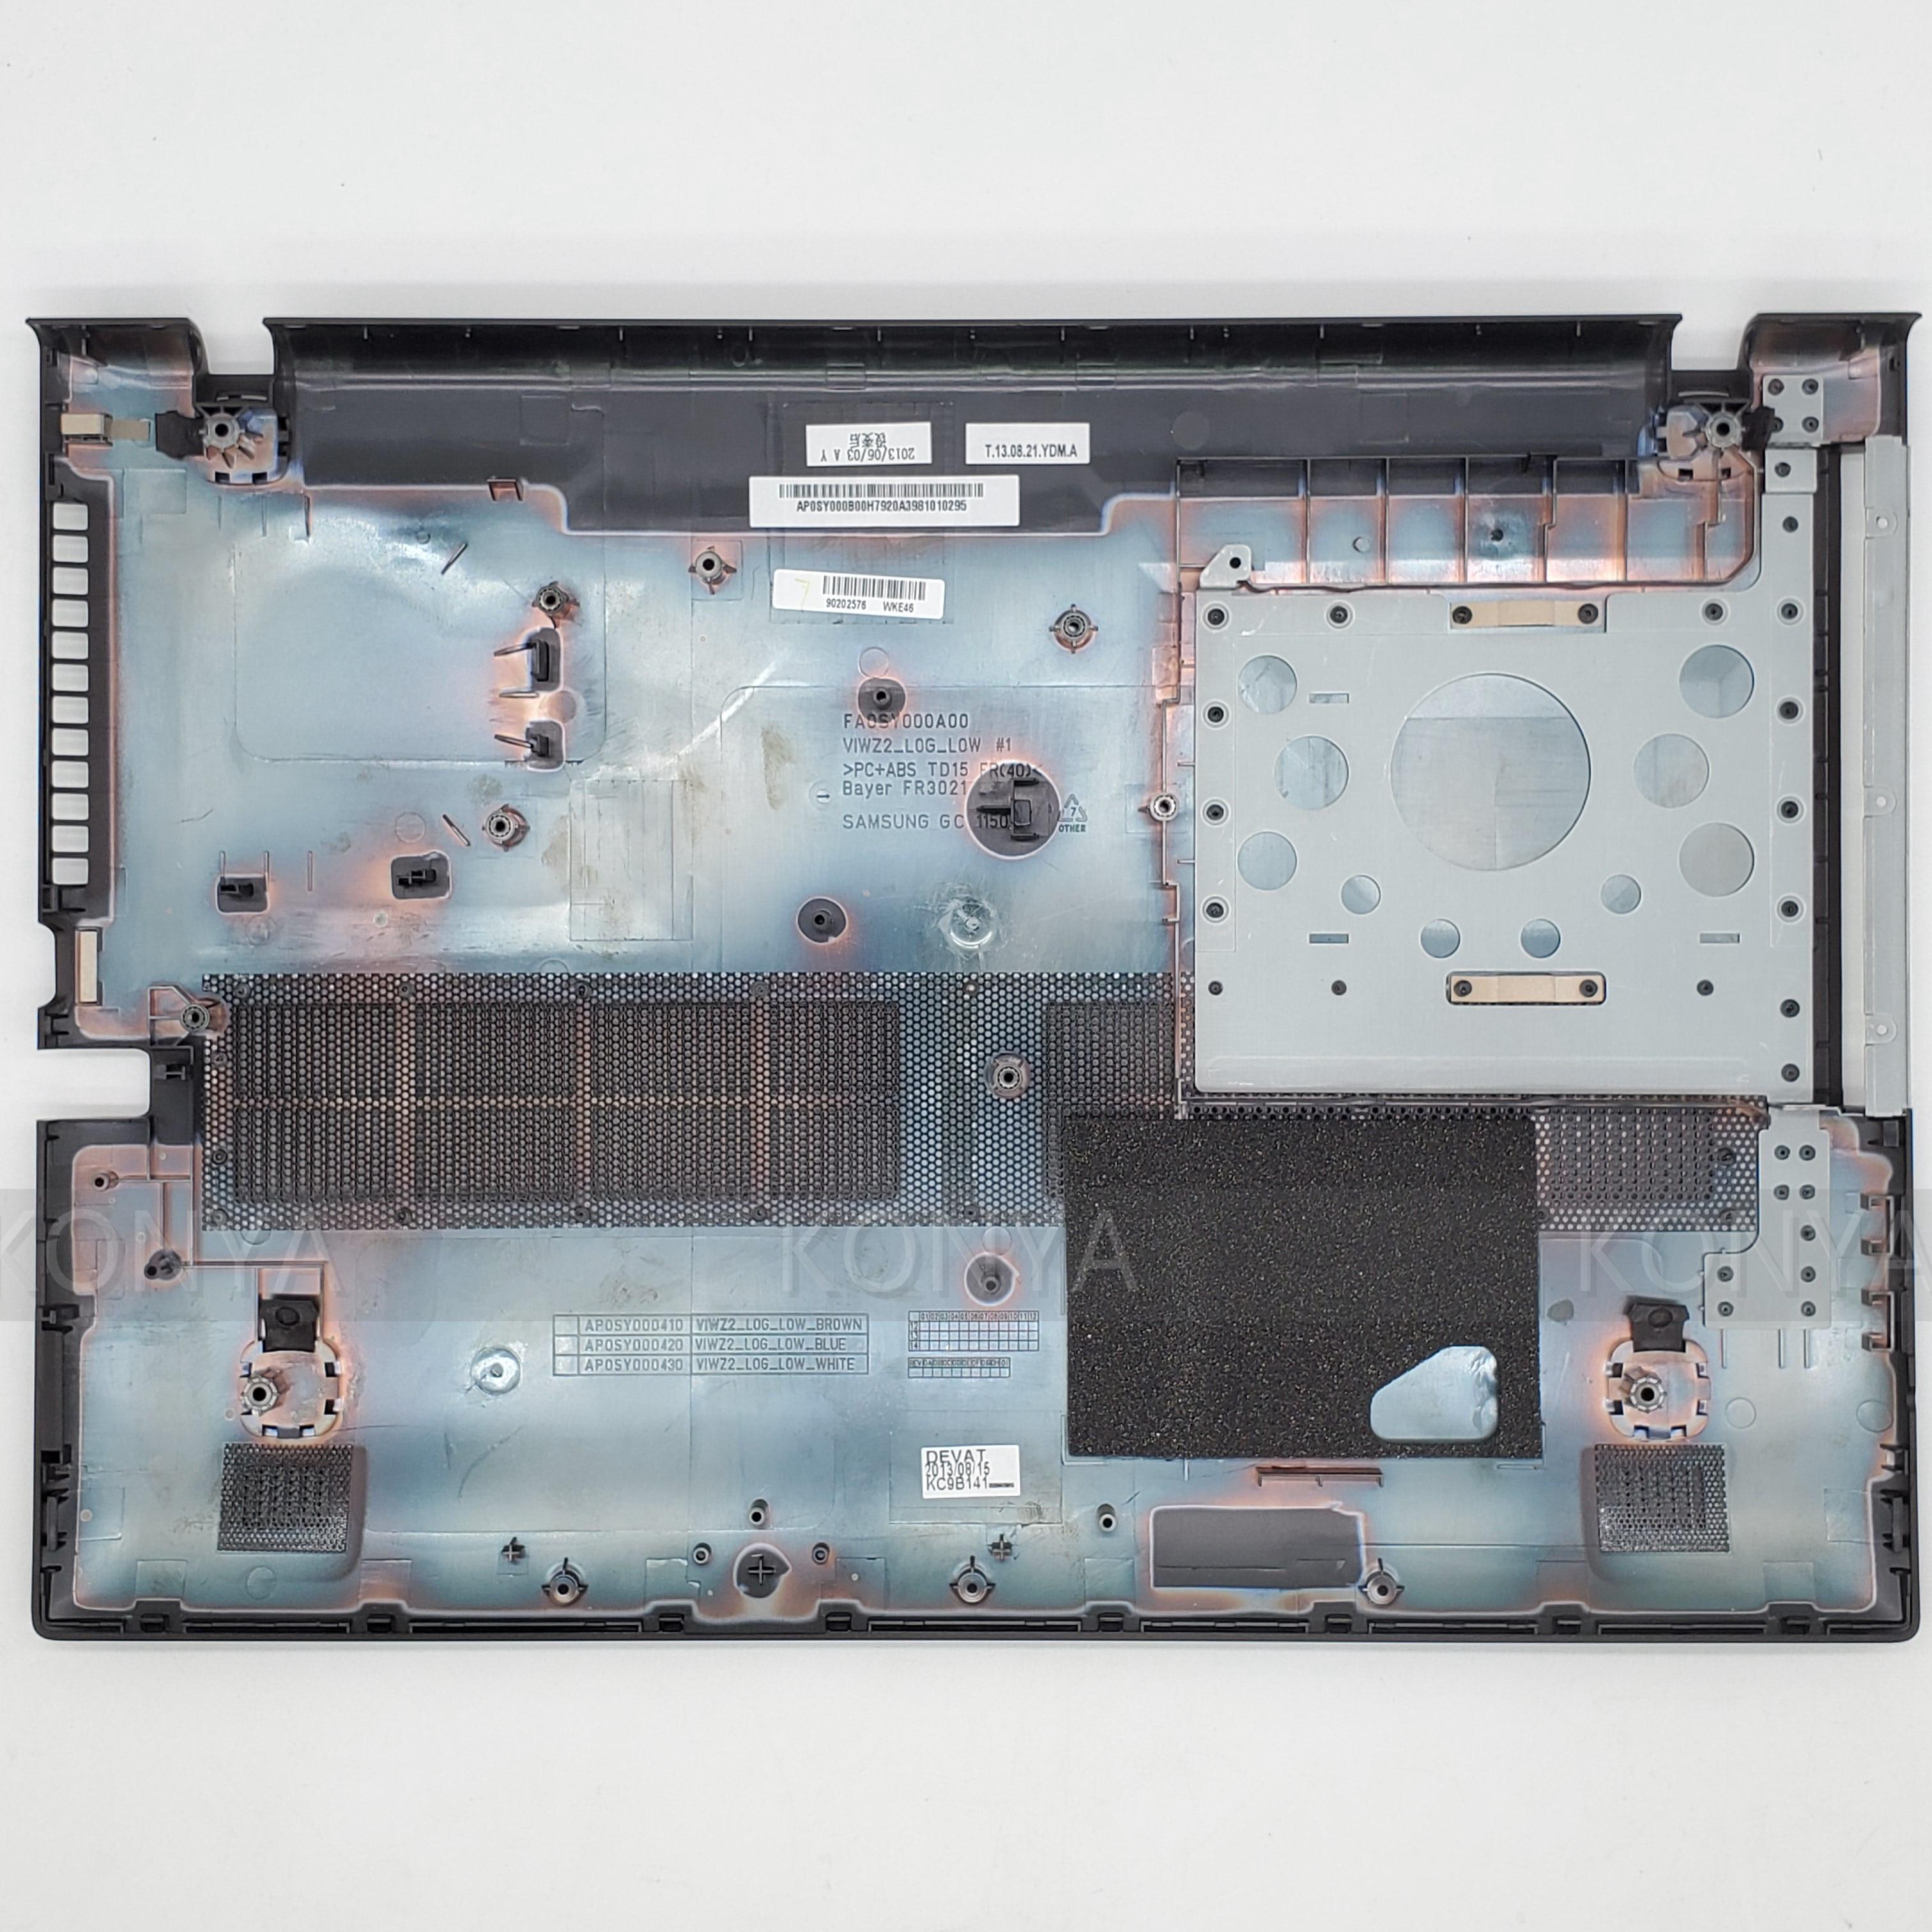 1.5TB INTERNAL SATA II DRIVE 32MB CACHE FIRMWARE CC91 SITE CODE Seagate 6002338 6002338